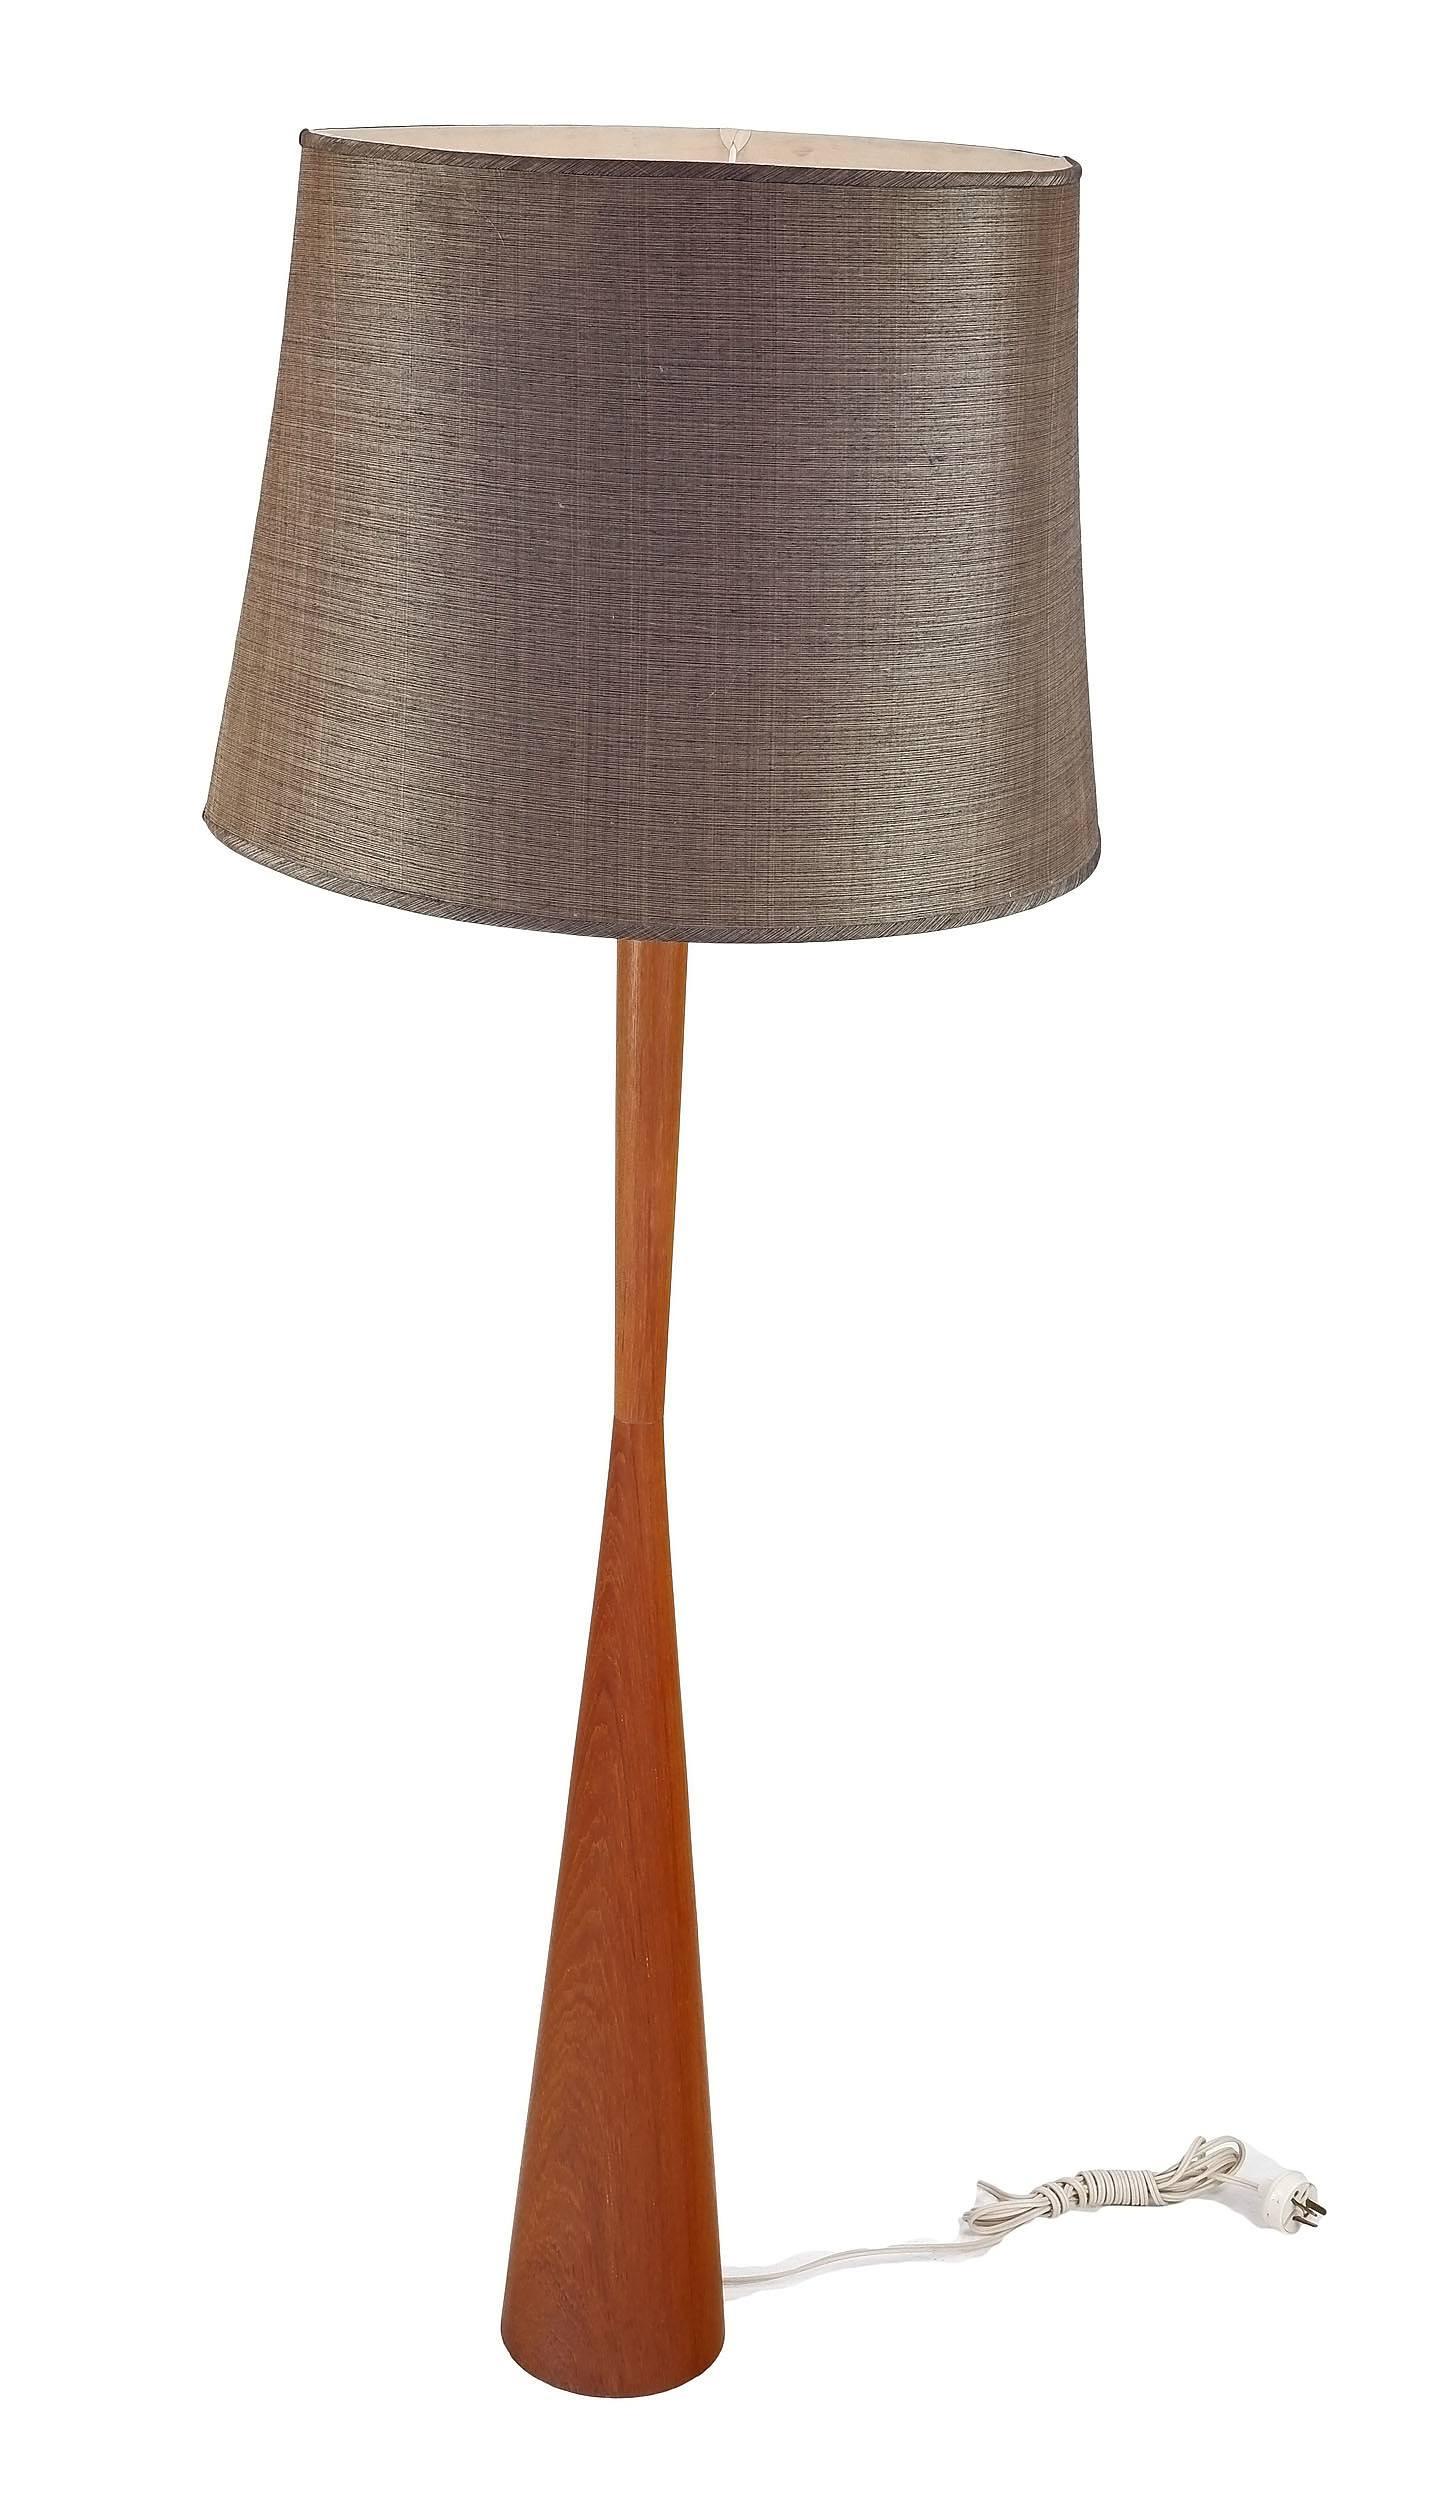 'Parker Knoll Hourglass Teak Floor Lamp'